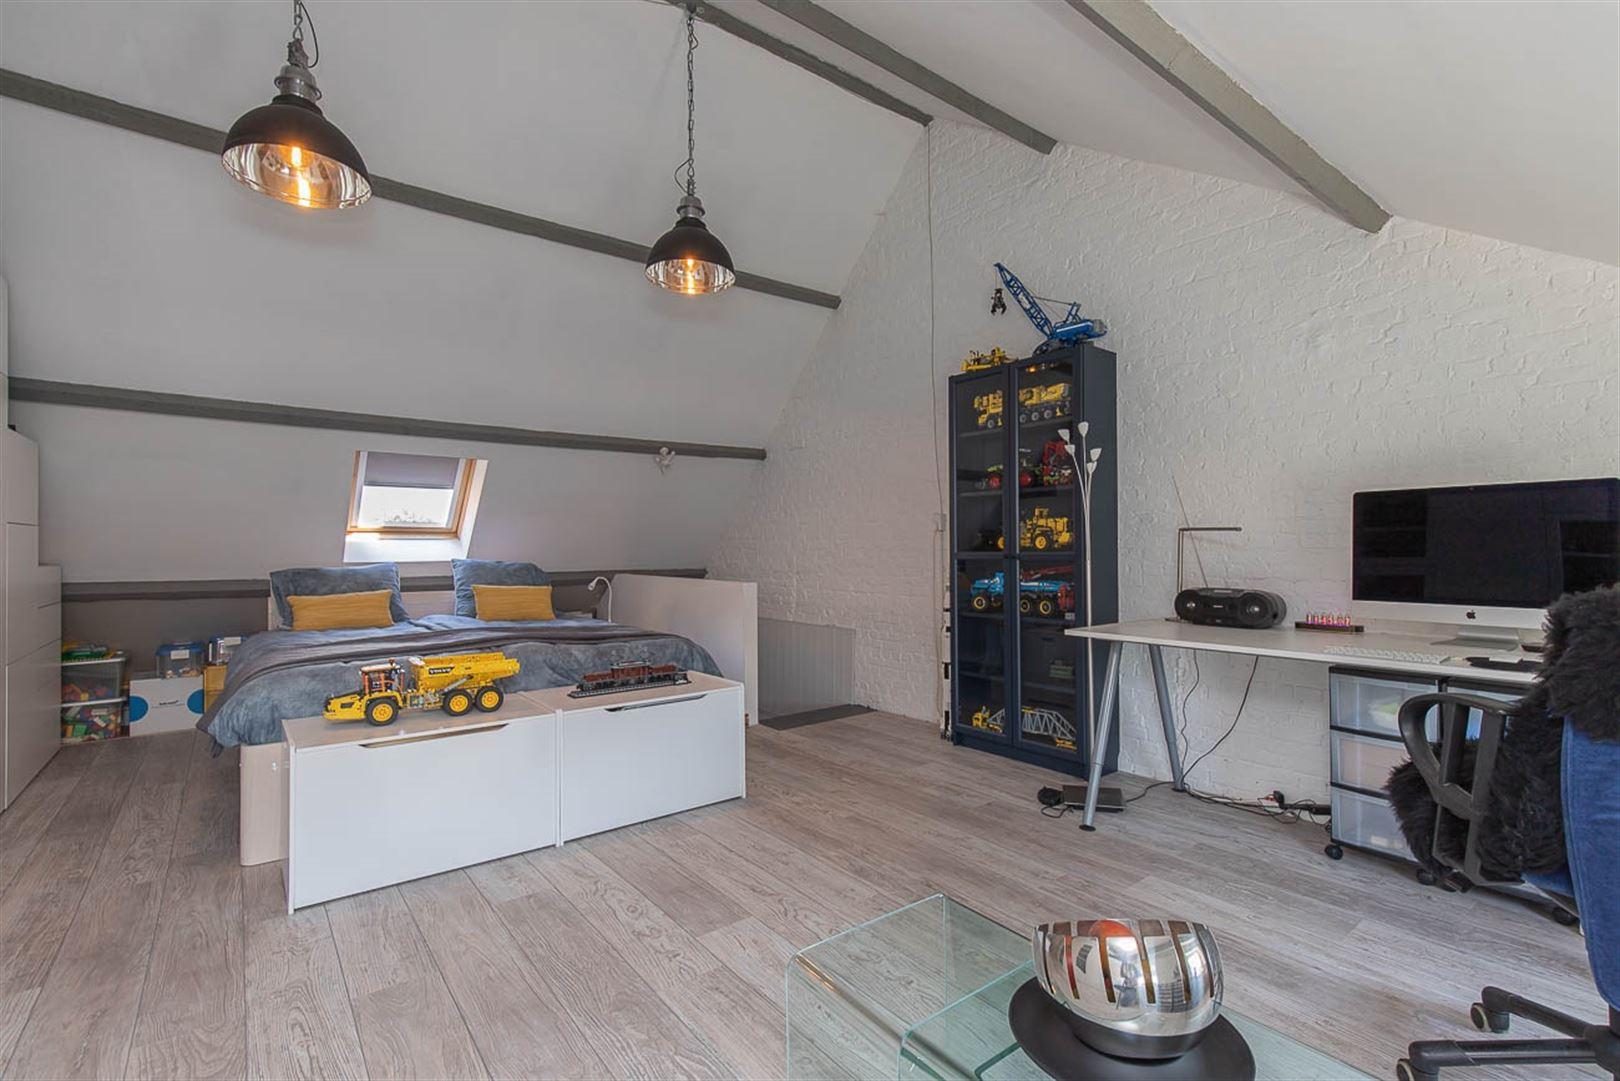 Foto 28 : Duplex/triplex te 9200 DENDERMONDE (België) - Prijs € 495.000